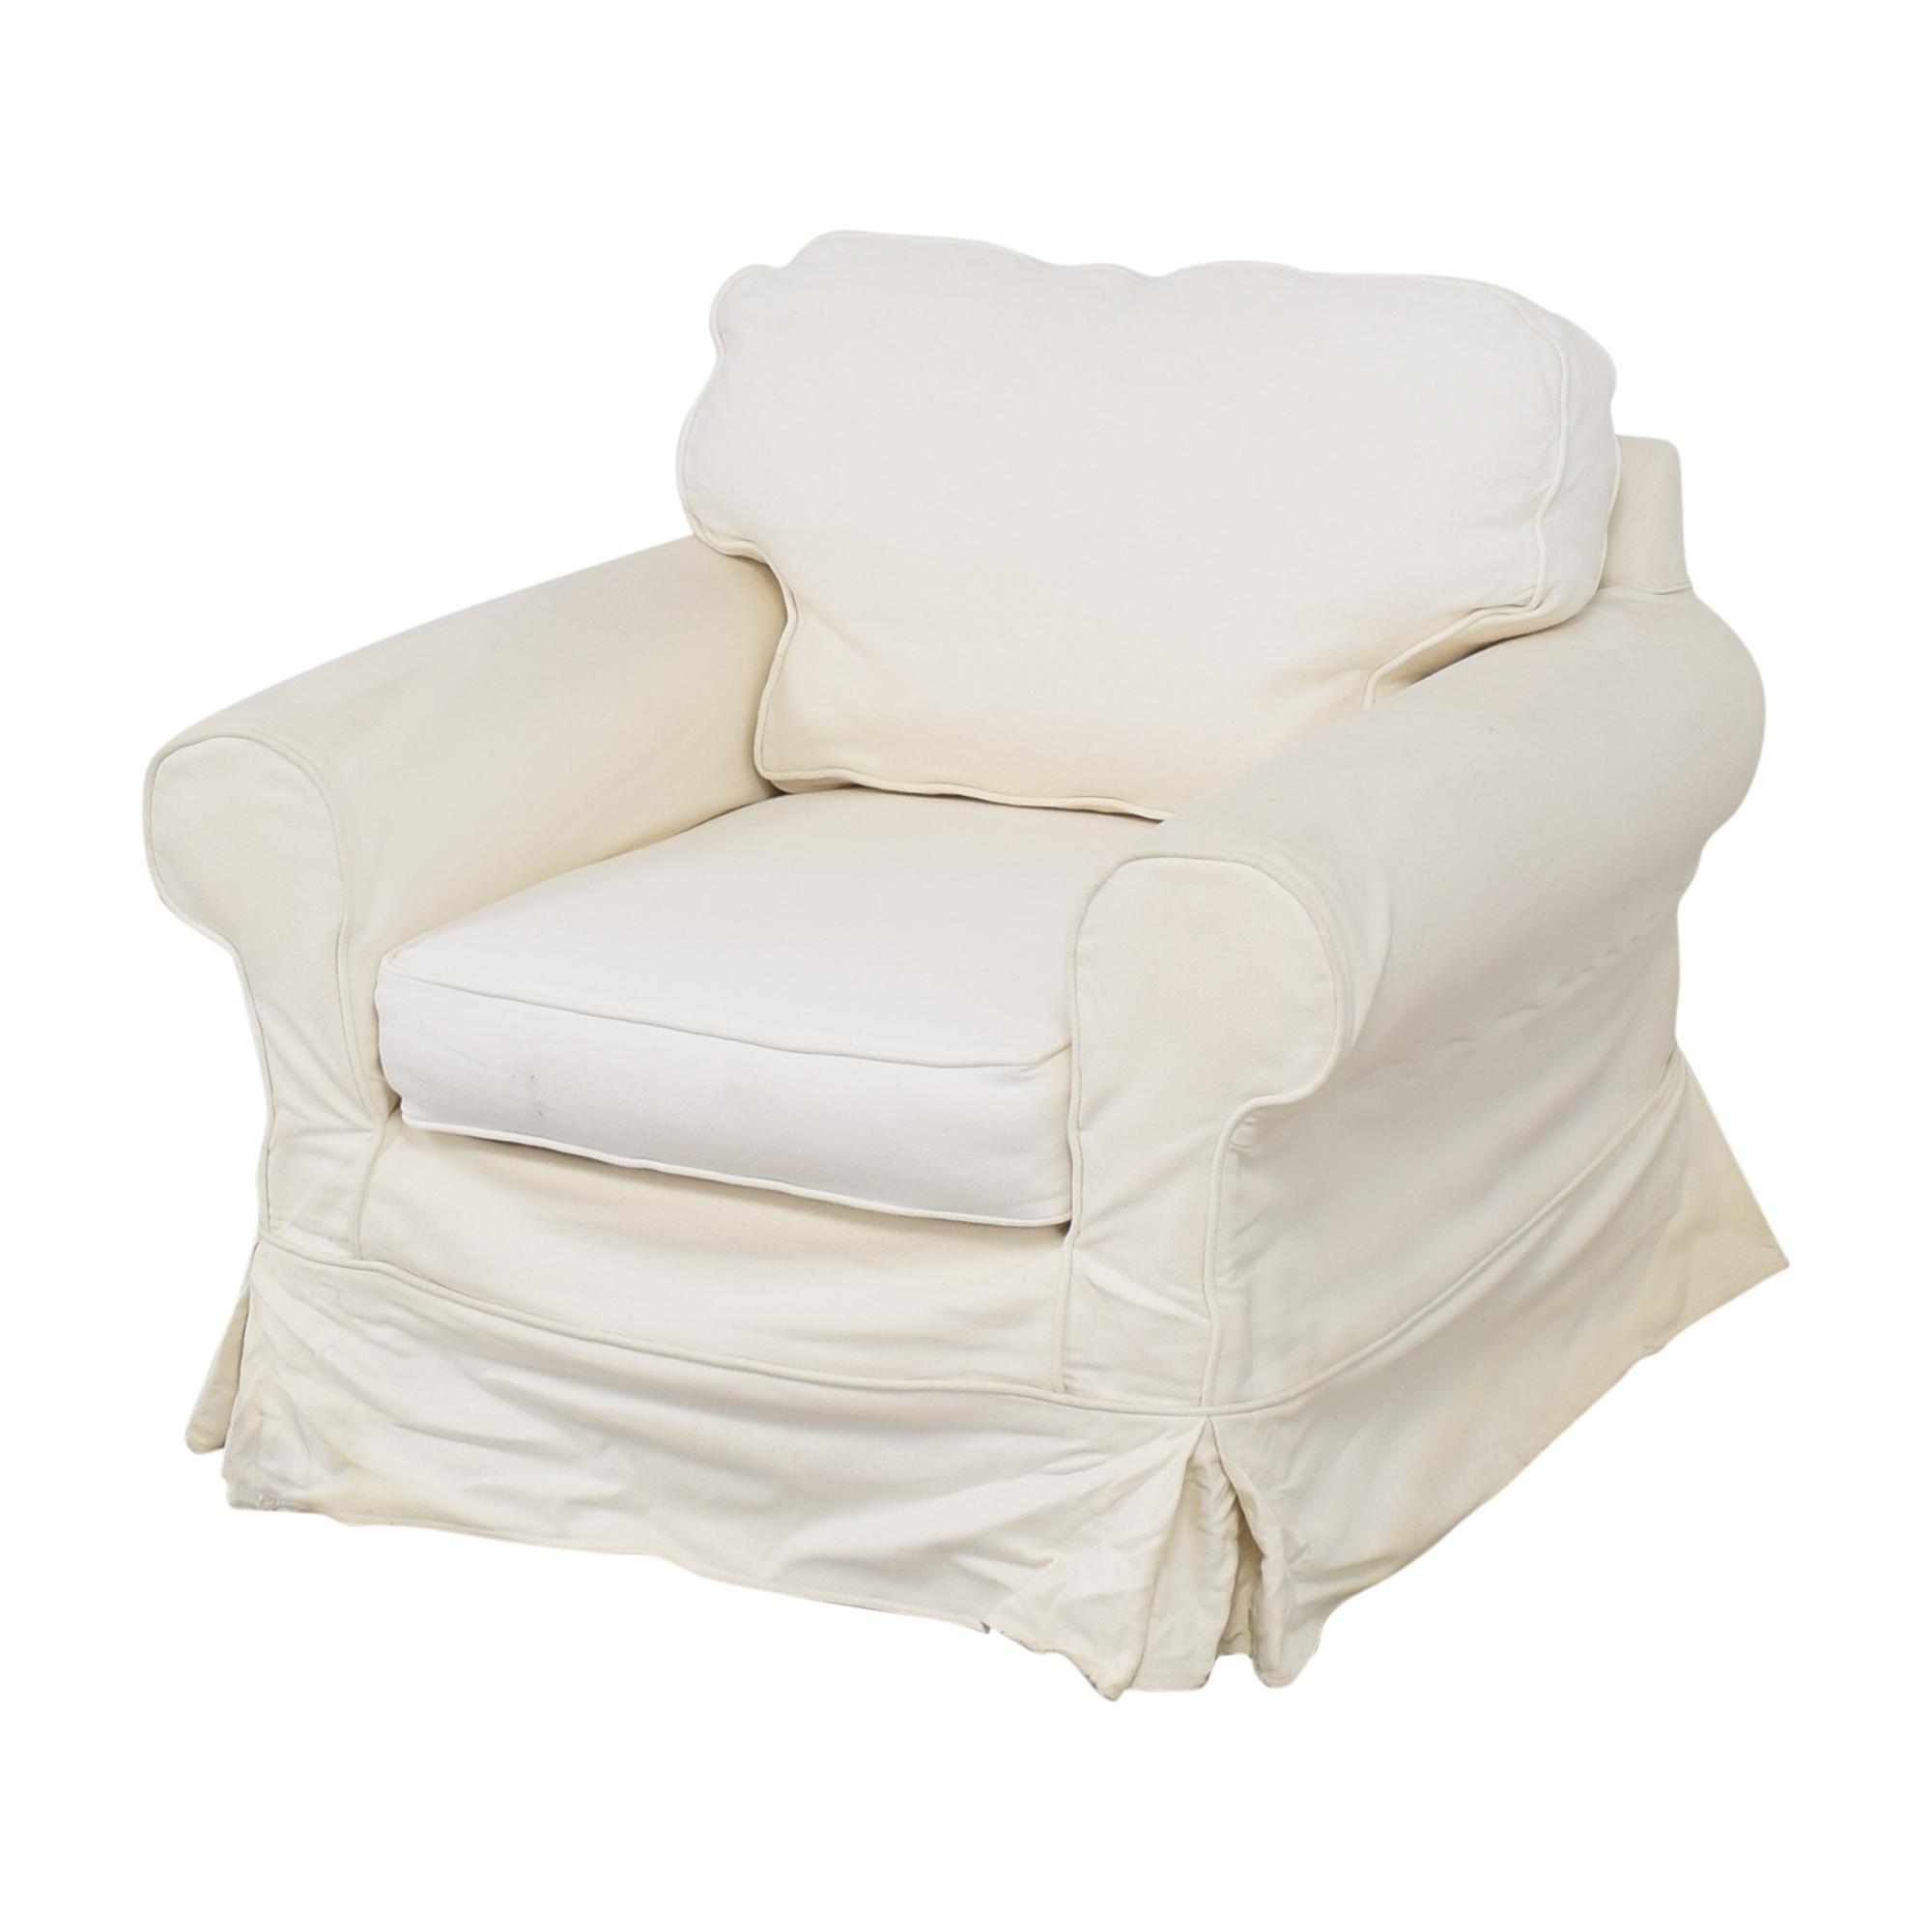 shop Mitchell Gold + Bob Williams Slipcovered Arm Chair Mitchell Gold + Bob Williams Accent Chairs